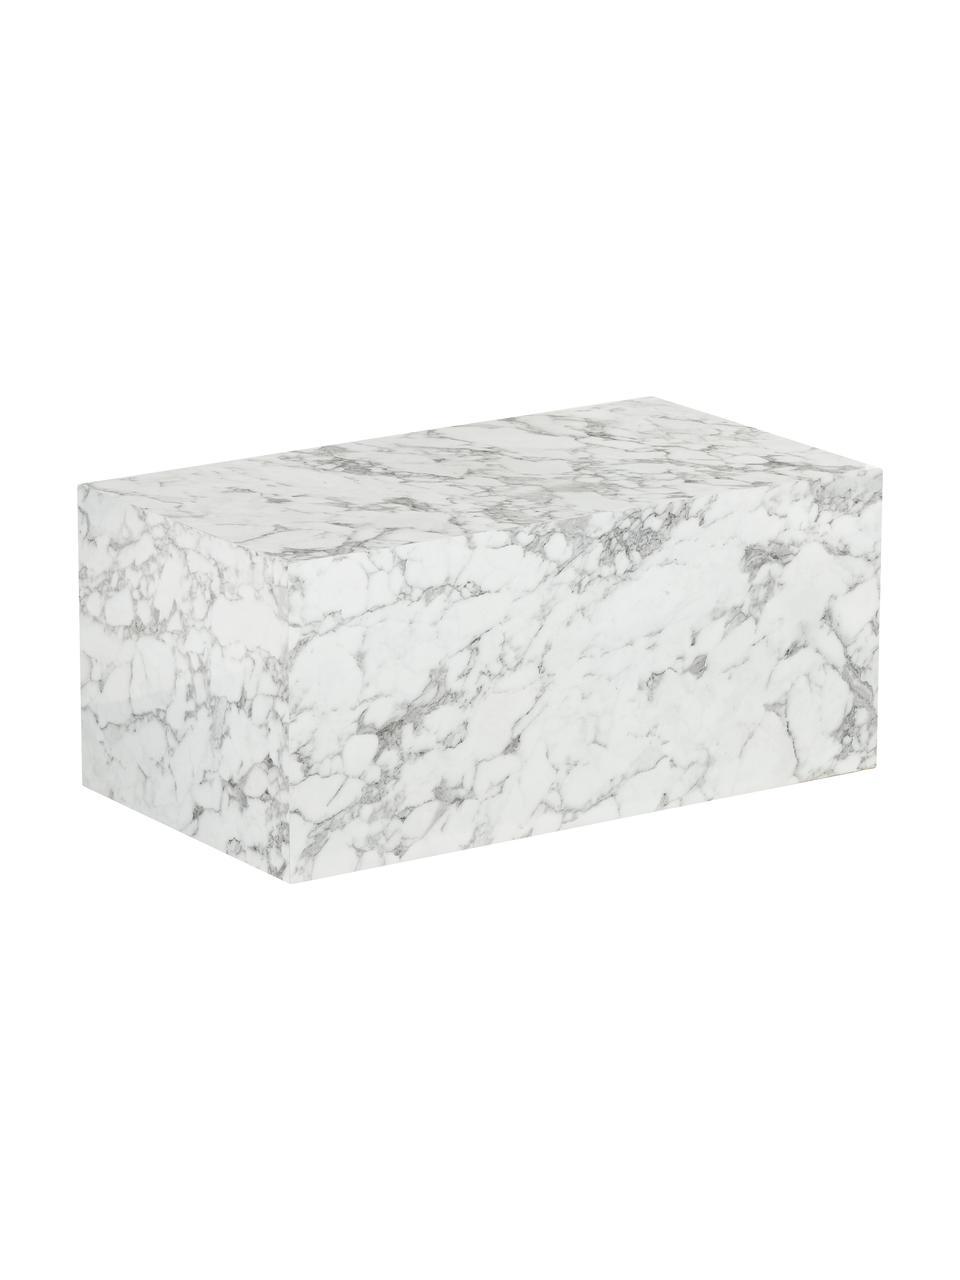 Table basse aspect marbre Lesley, Blanc, marbré